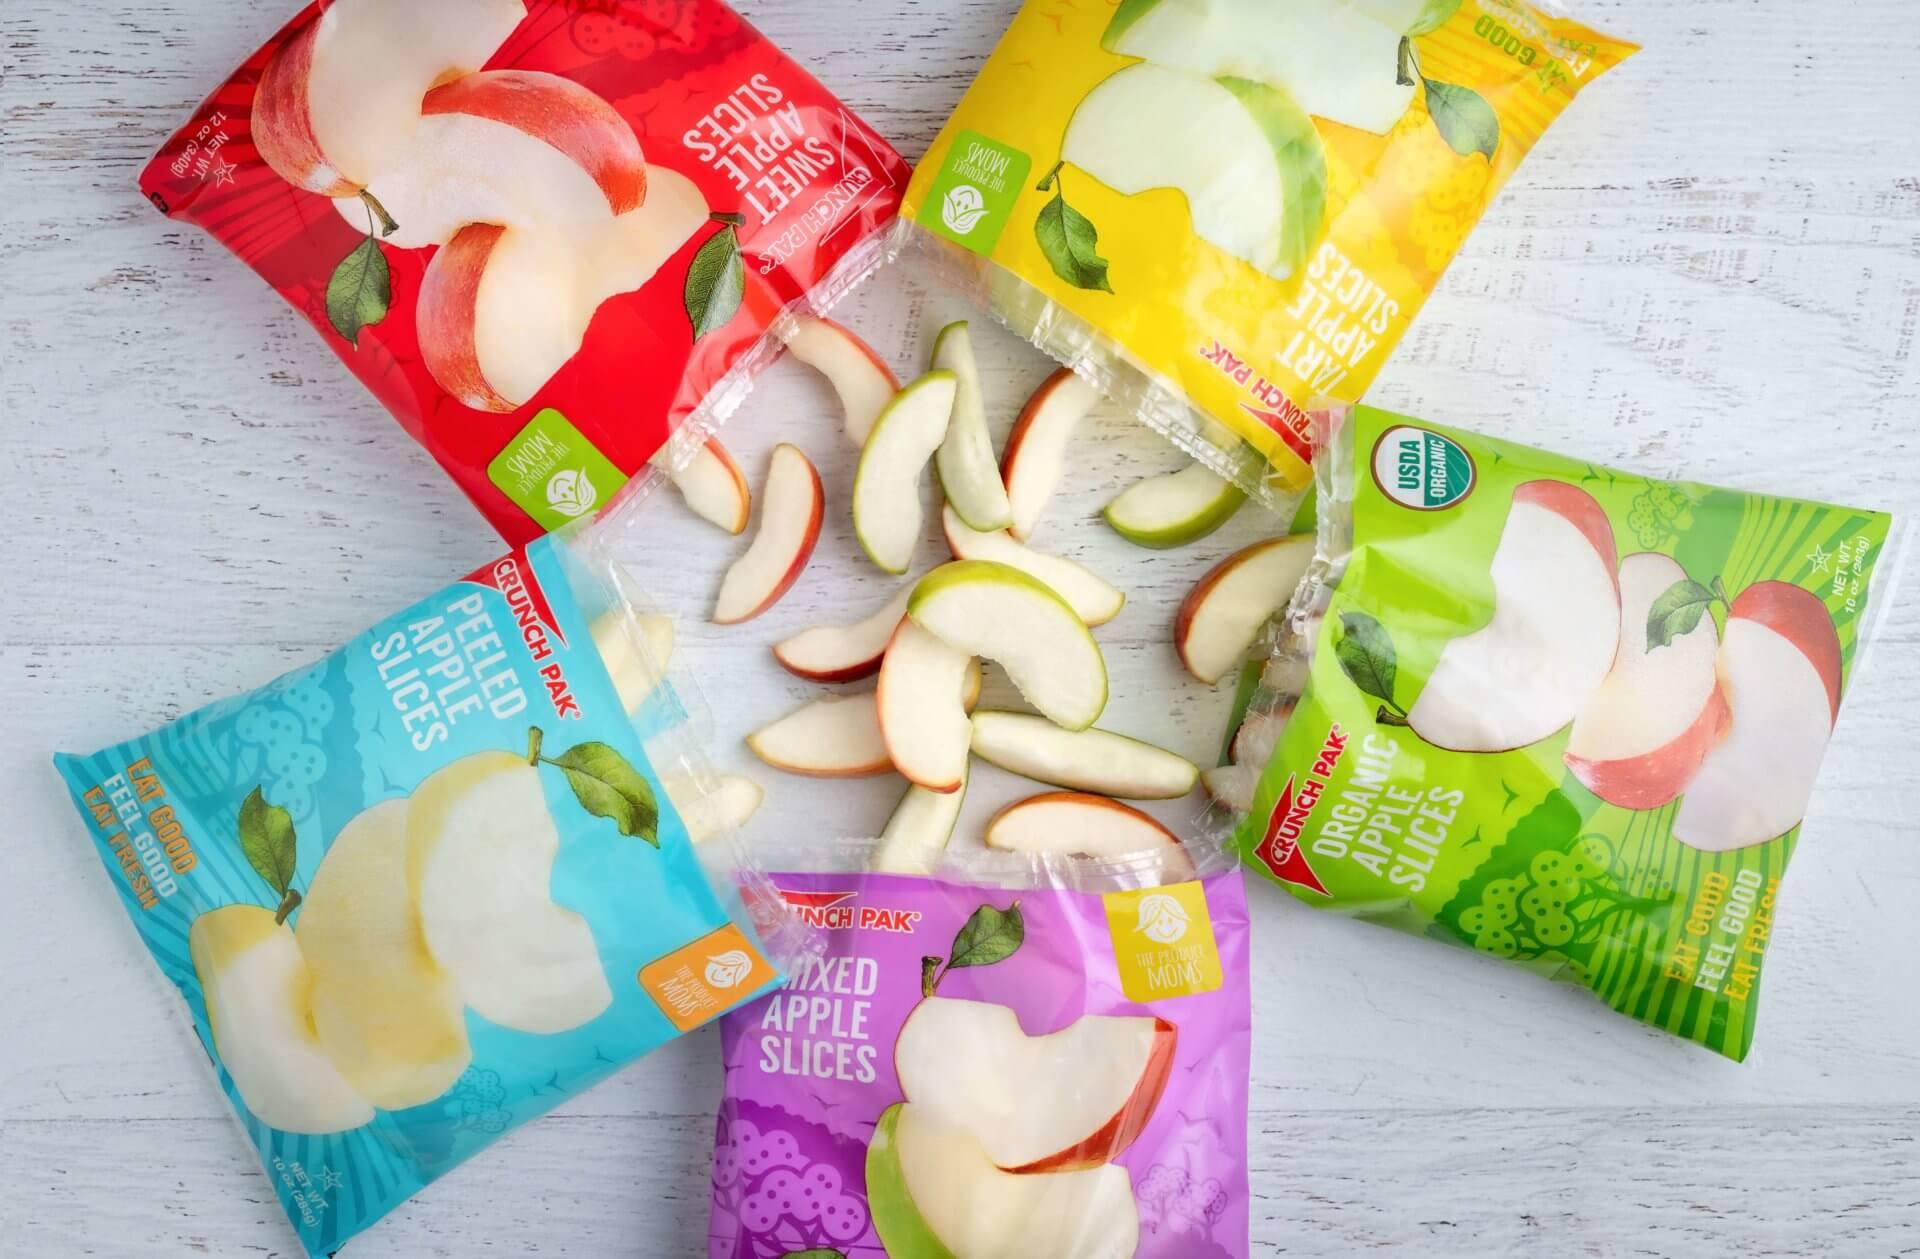 Celebrating The Produce Moms® Crunch Pak® Apple Slices